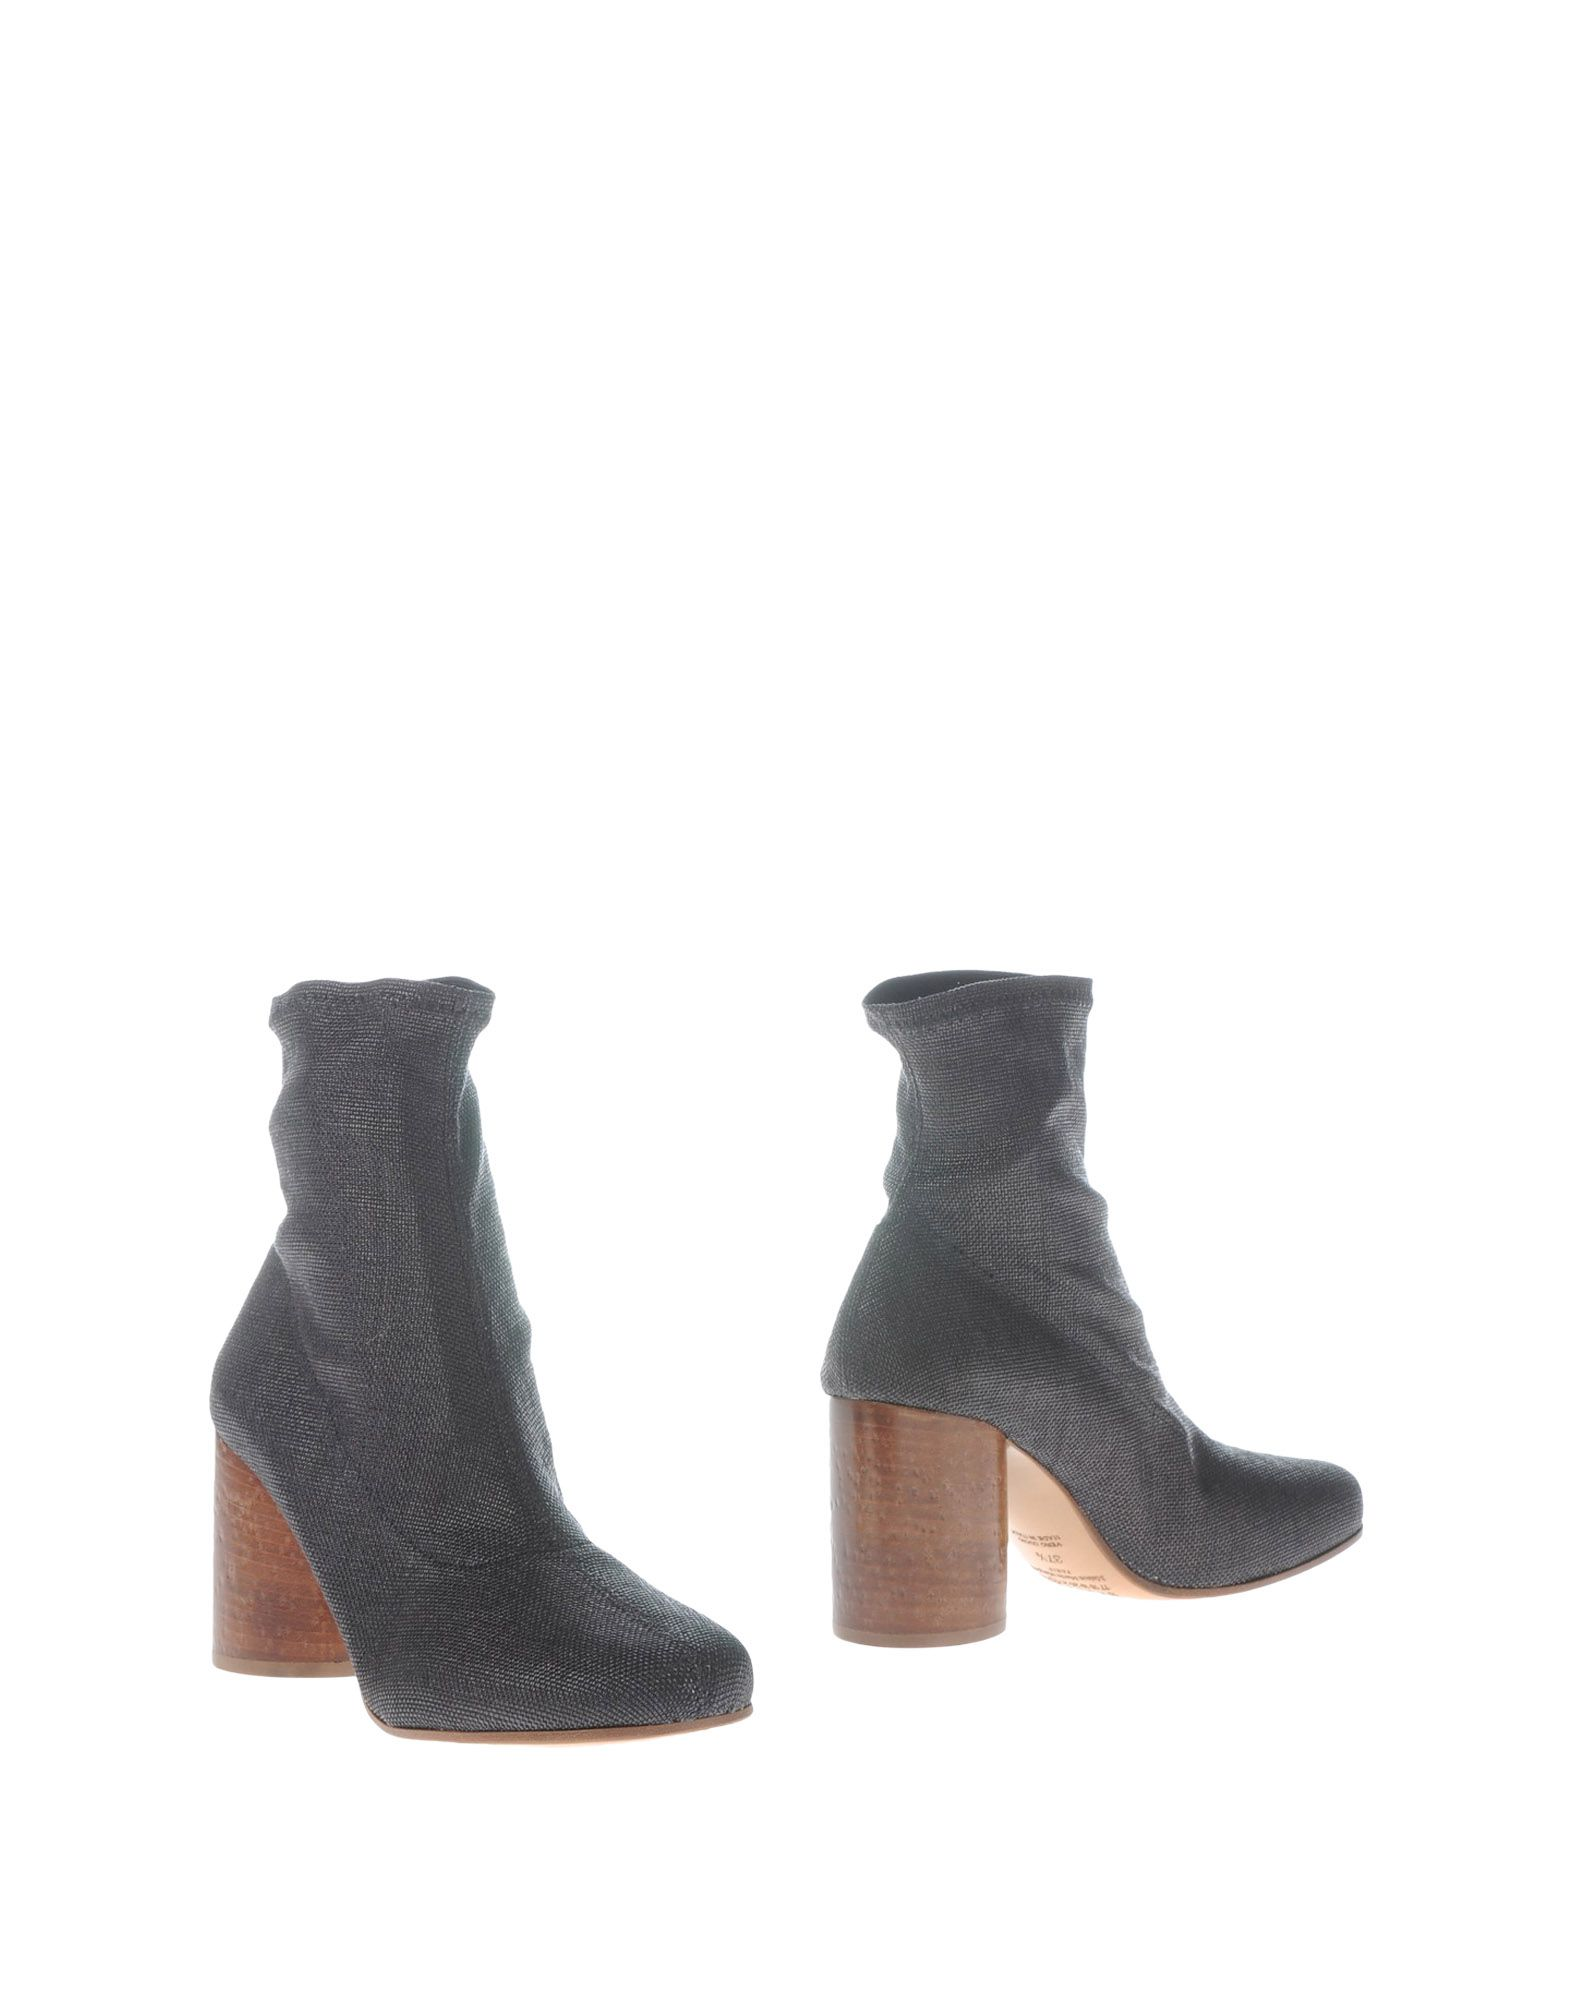 цена  MAISON MARGIELA Полусапоги и высокие ботинки  онлайн в 2017 году